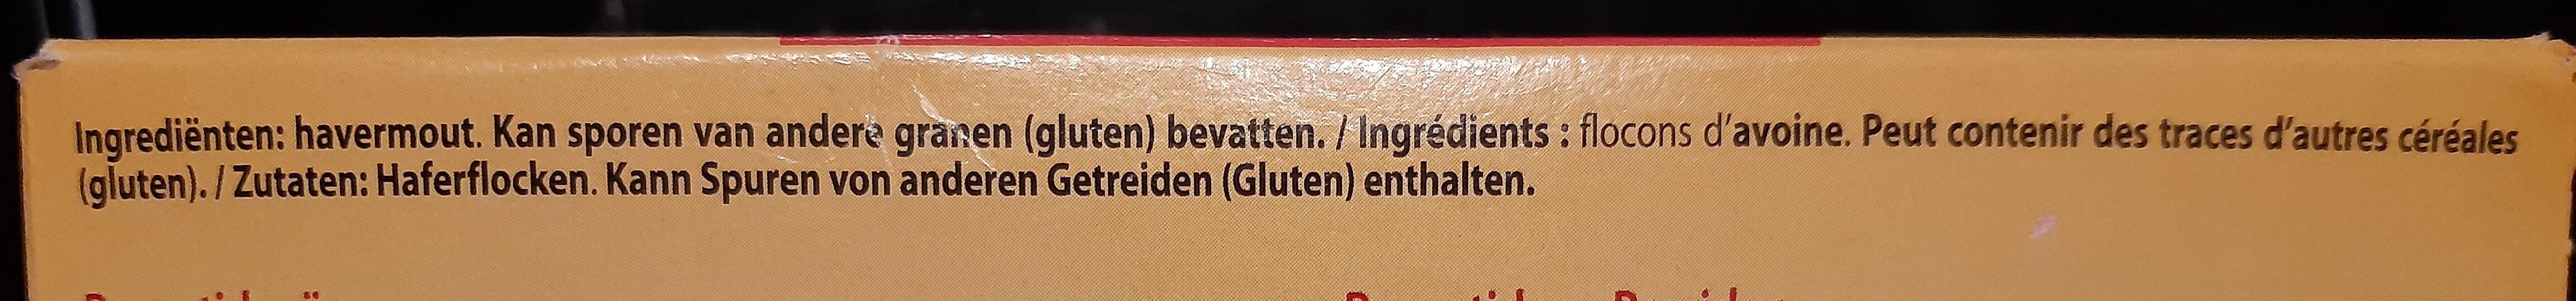 Flocons d'avoine - Zutaten - de